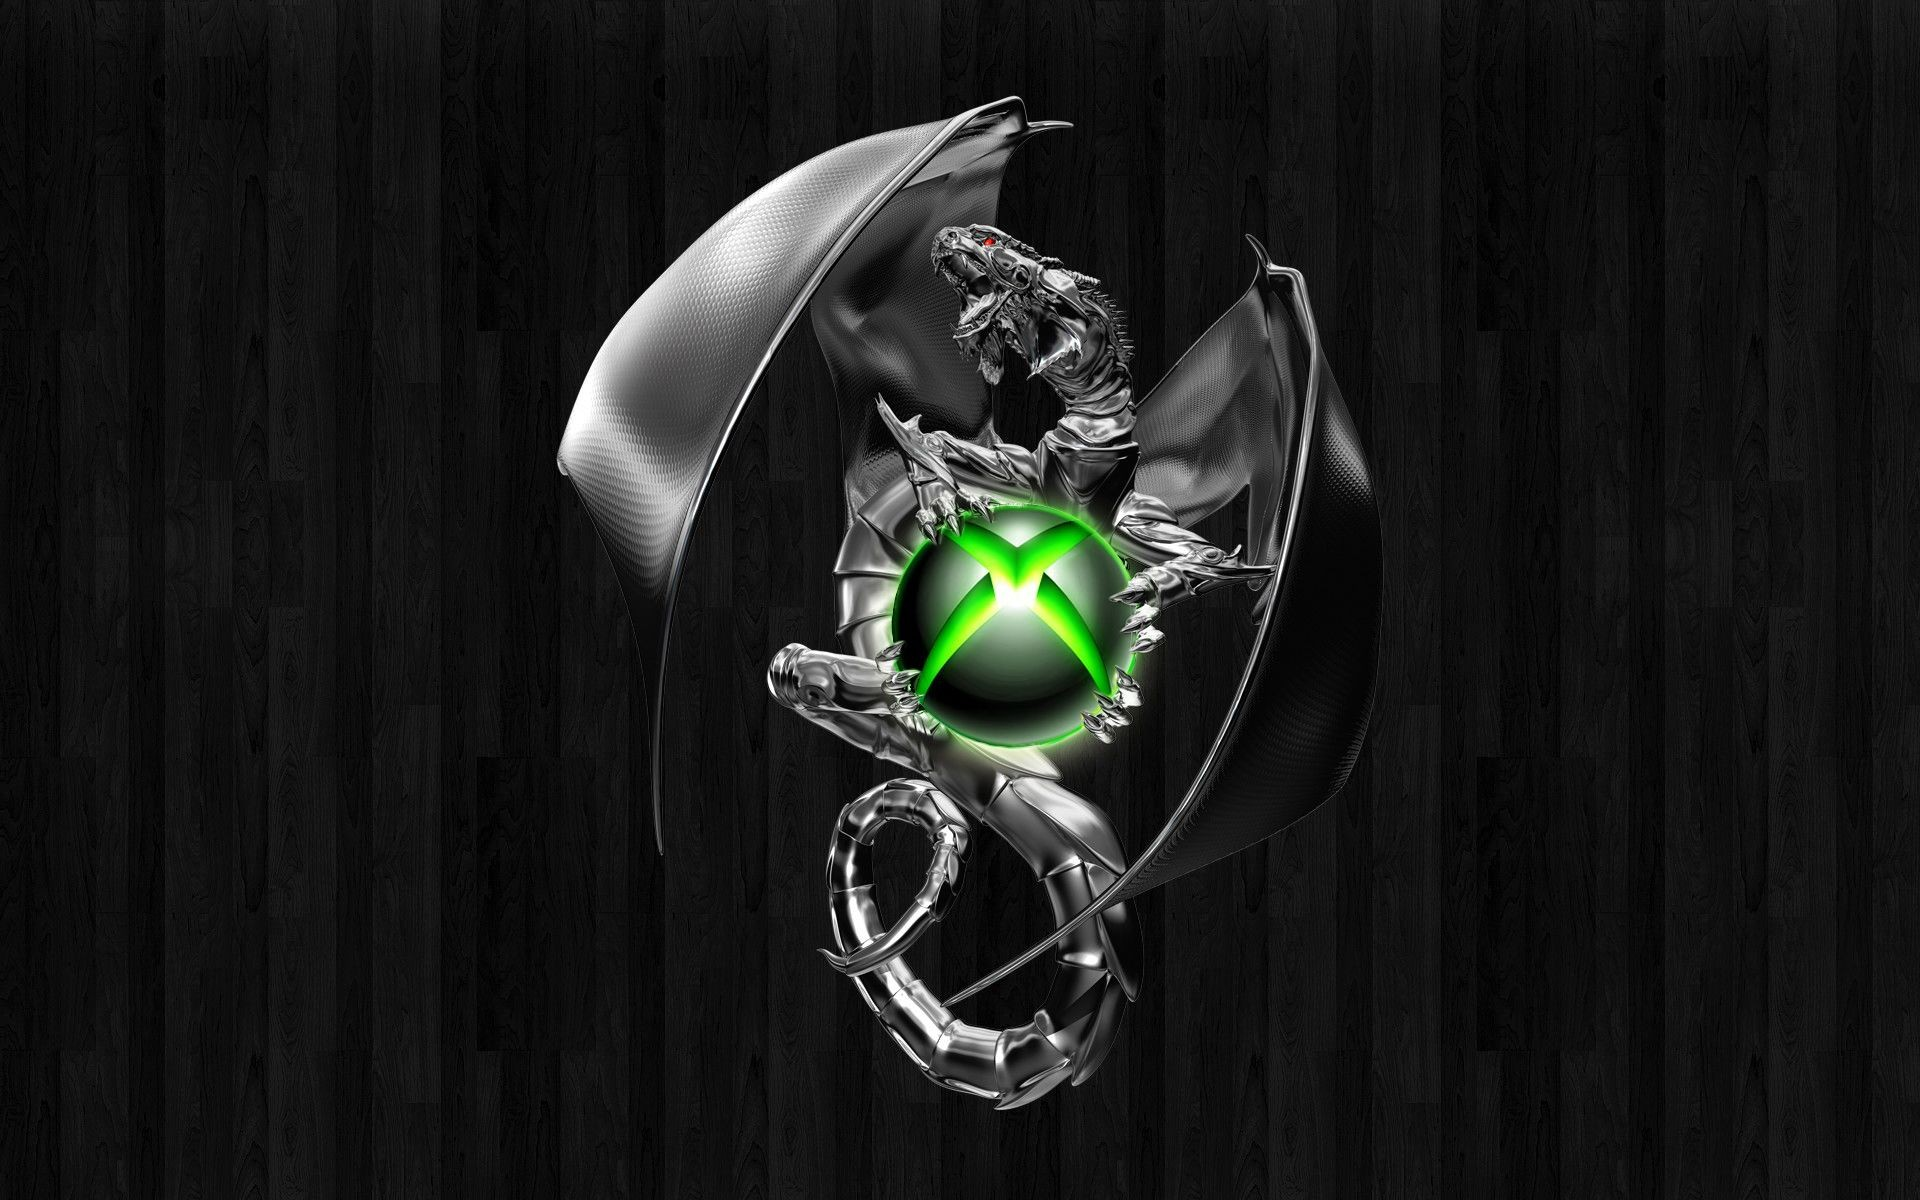 Xbox wallpaper ·① Download free stunning High Resolution ...